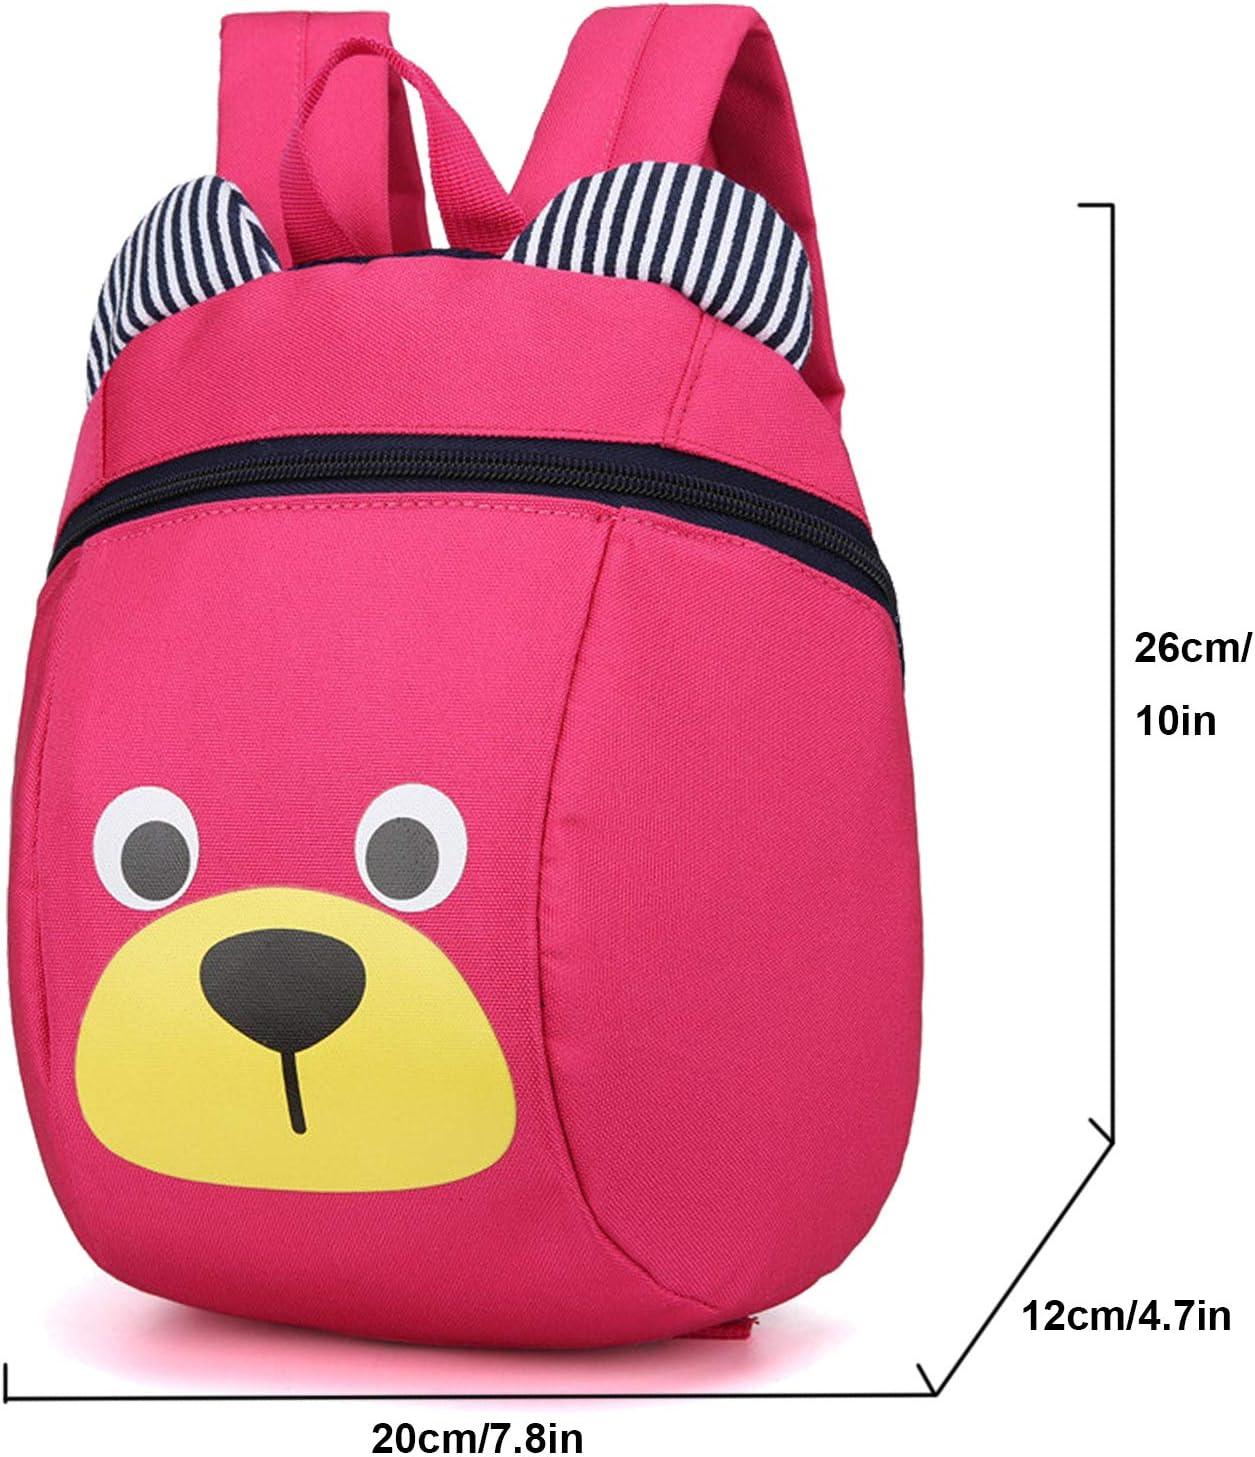 Kids Toddler Backpack Leash Boys Girls Lunchbox Preschool Bag Red